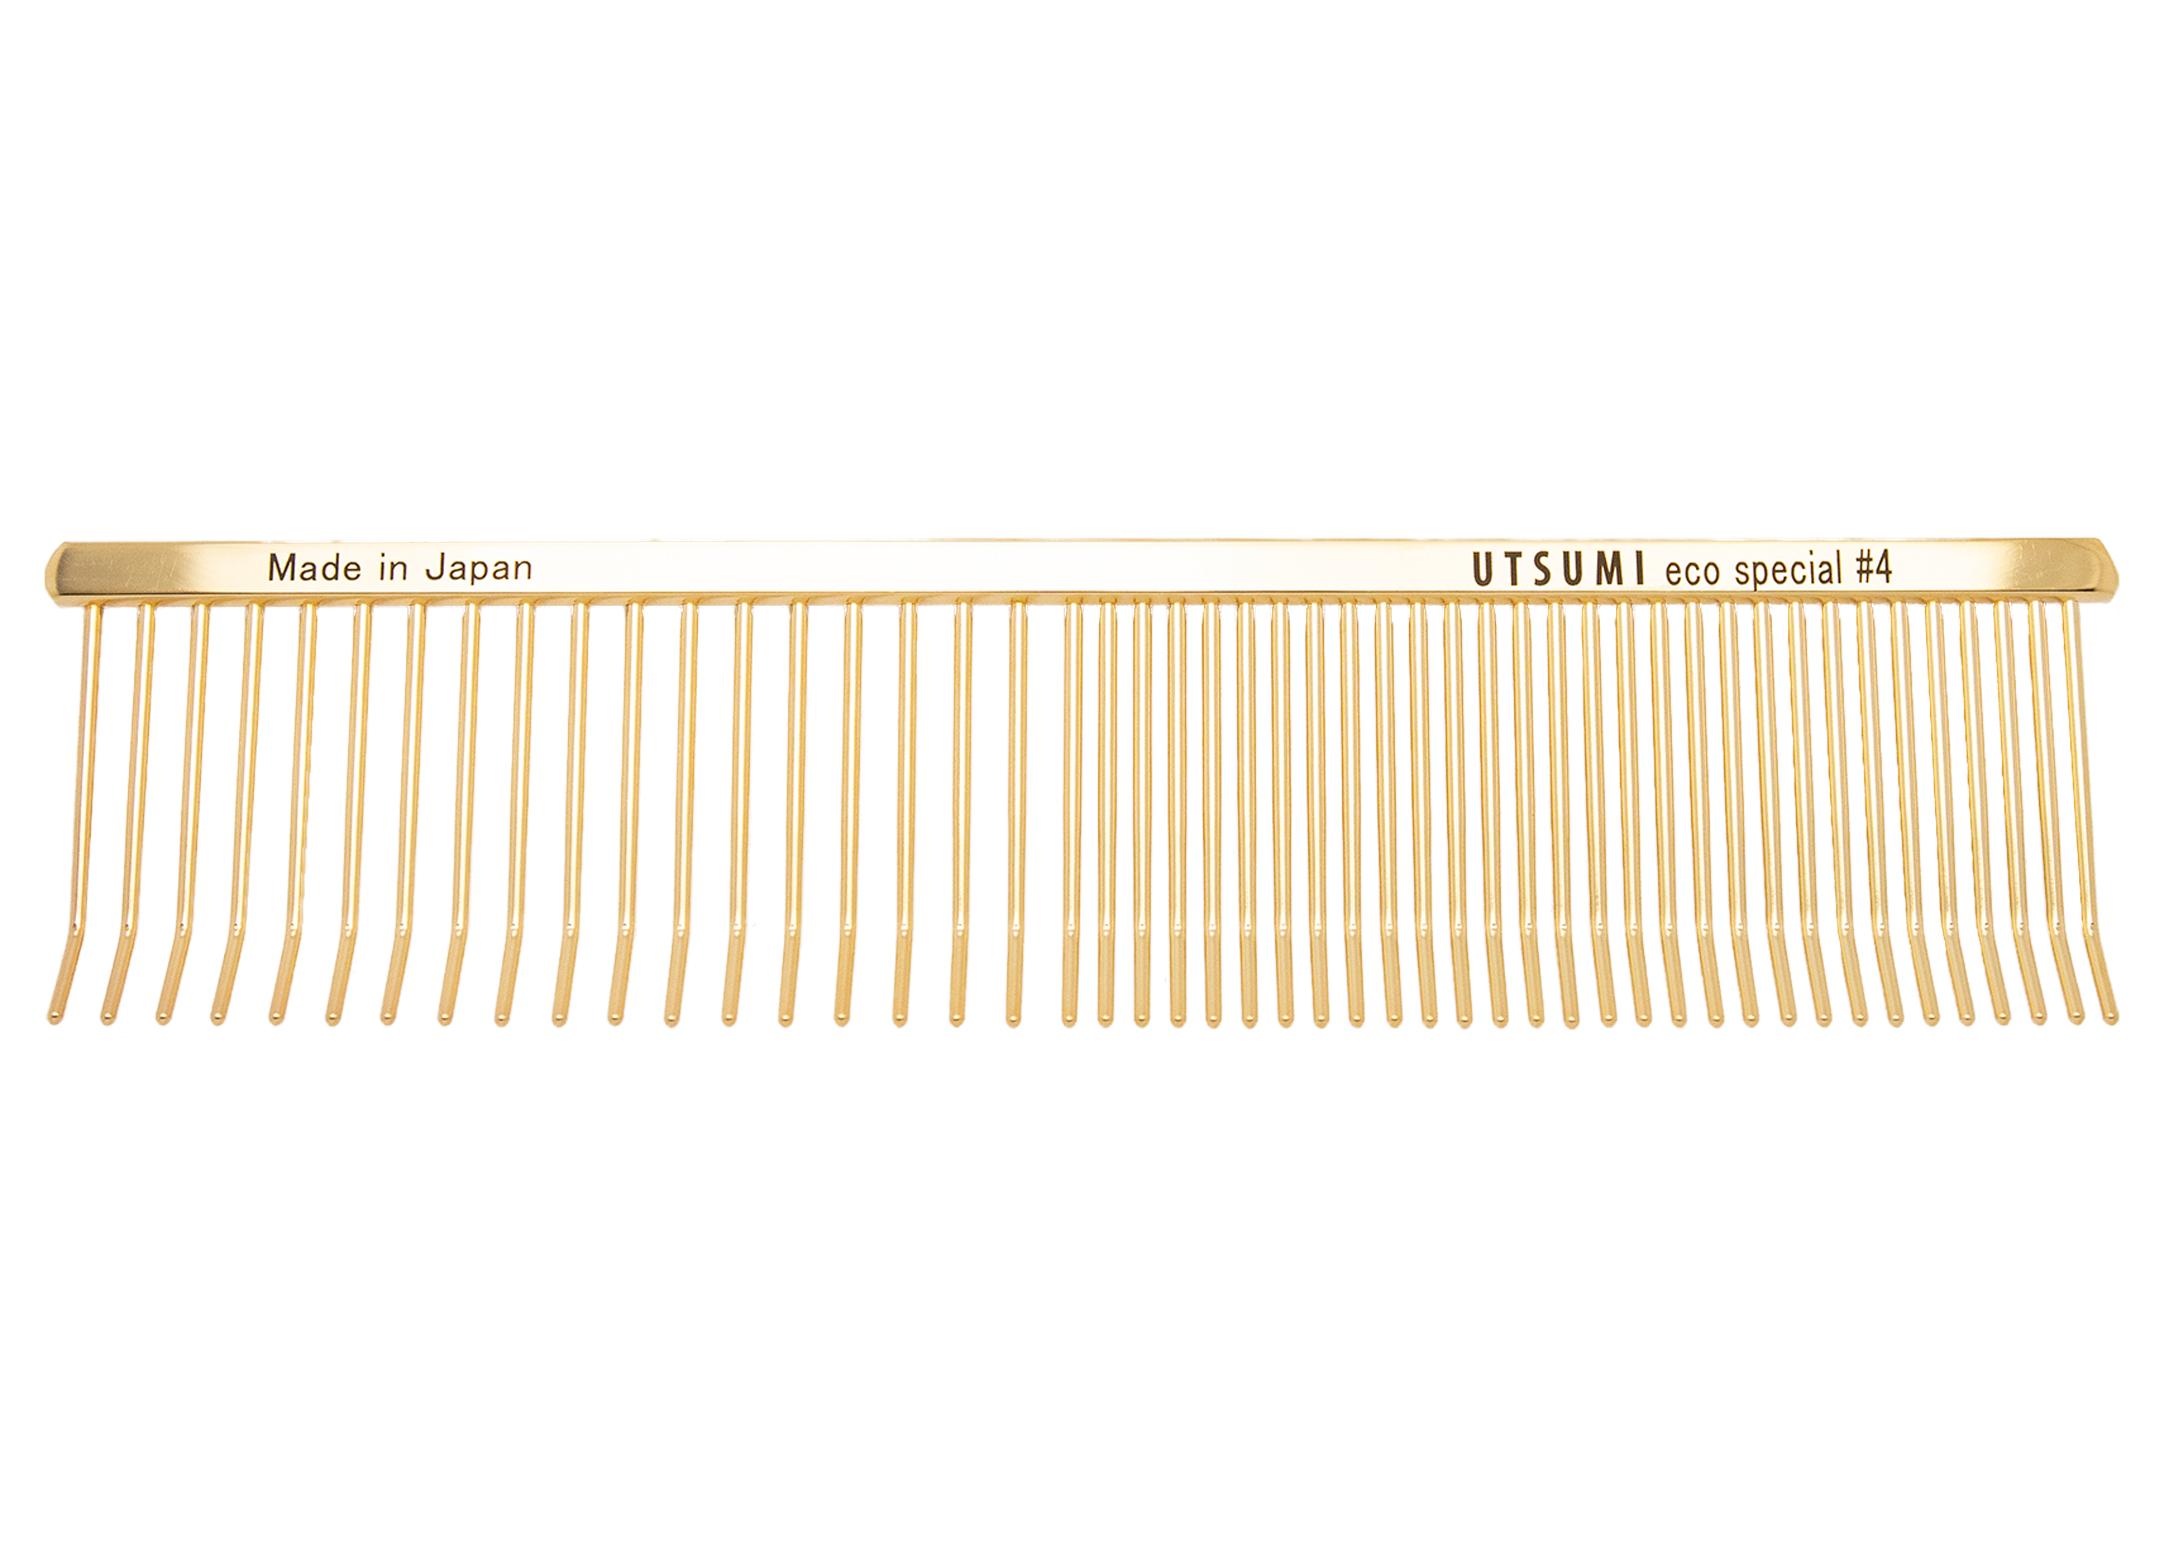 Utsumi Eco Special #4 Gold Comb 19cm